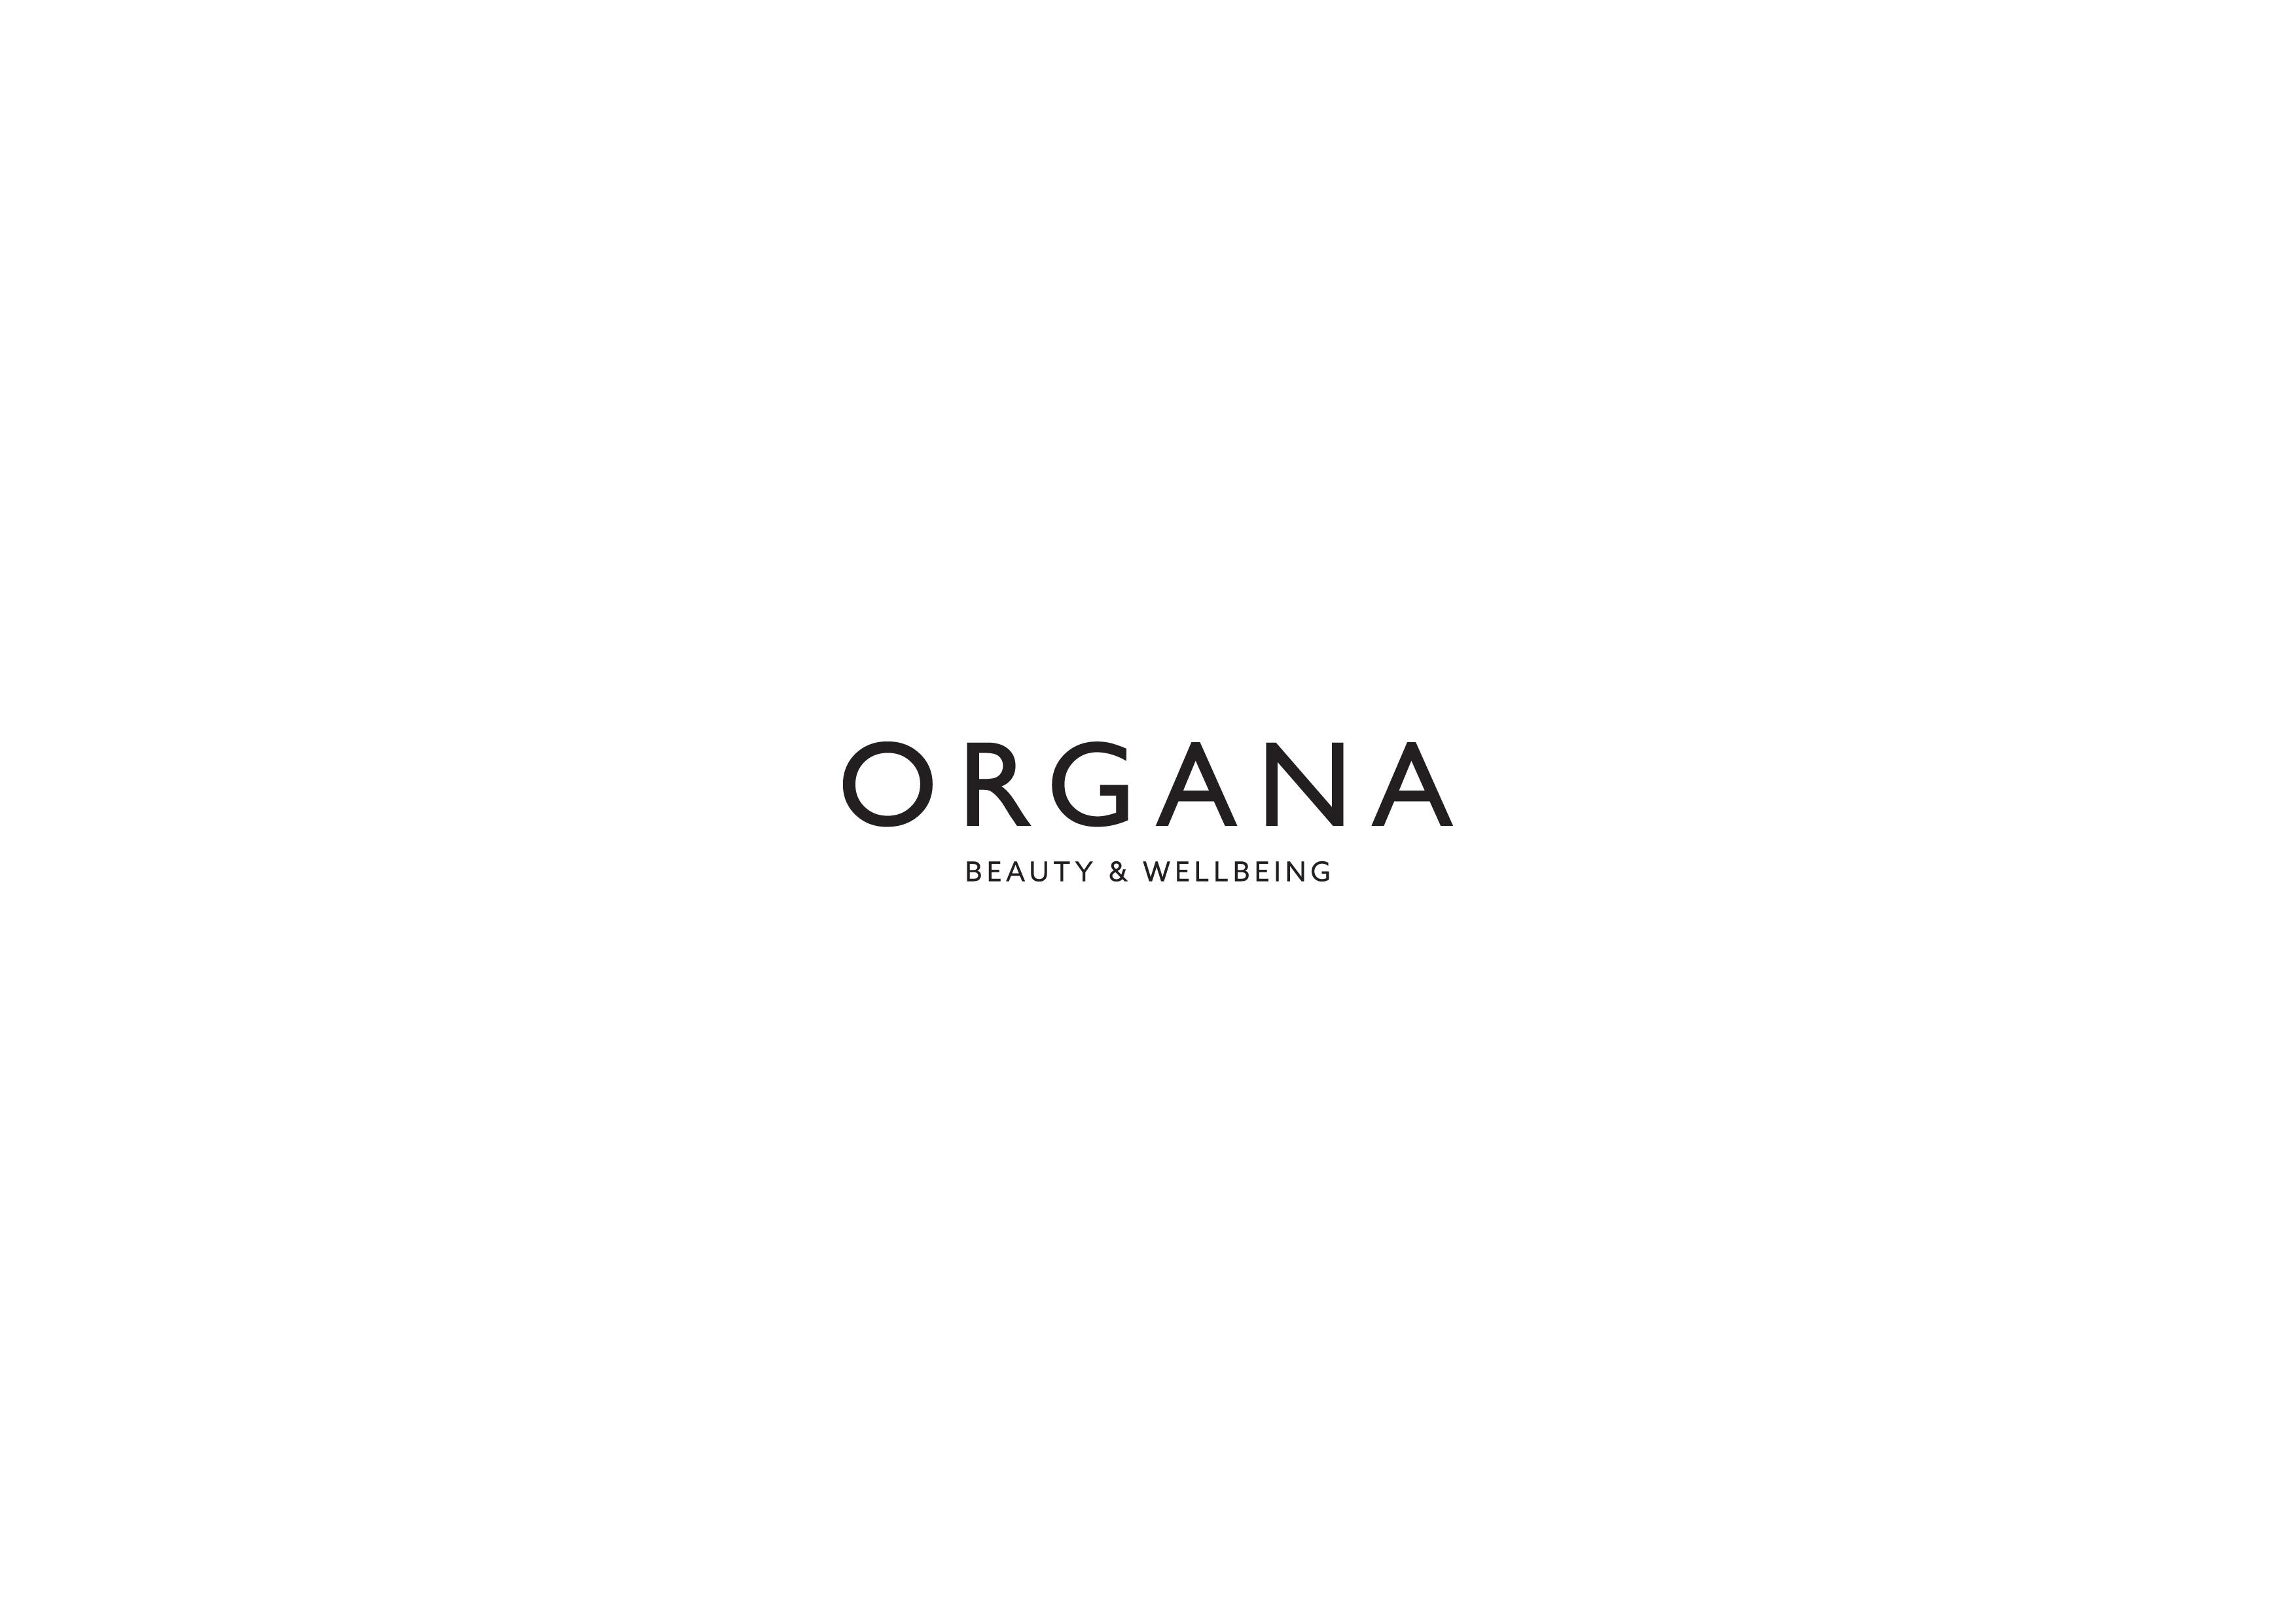 Organa logo on a white background